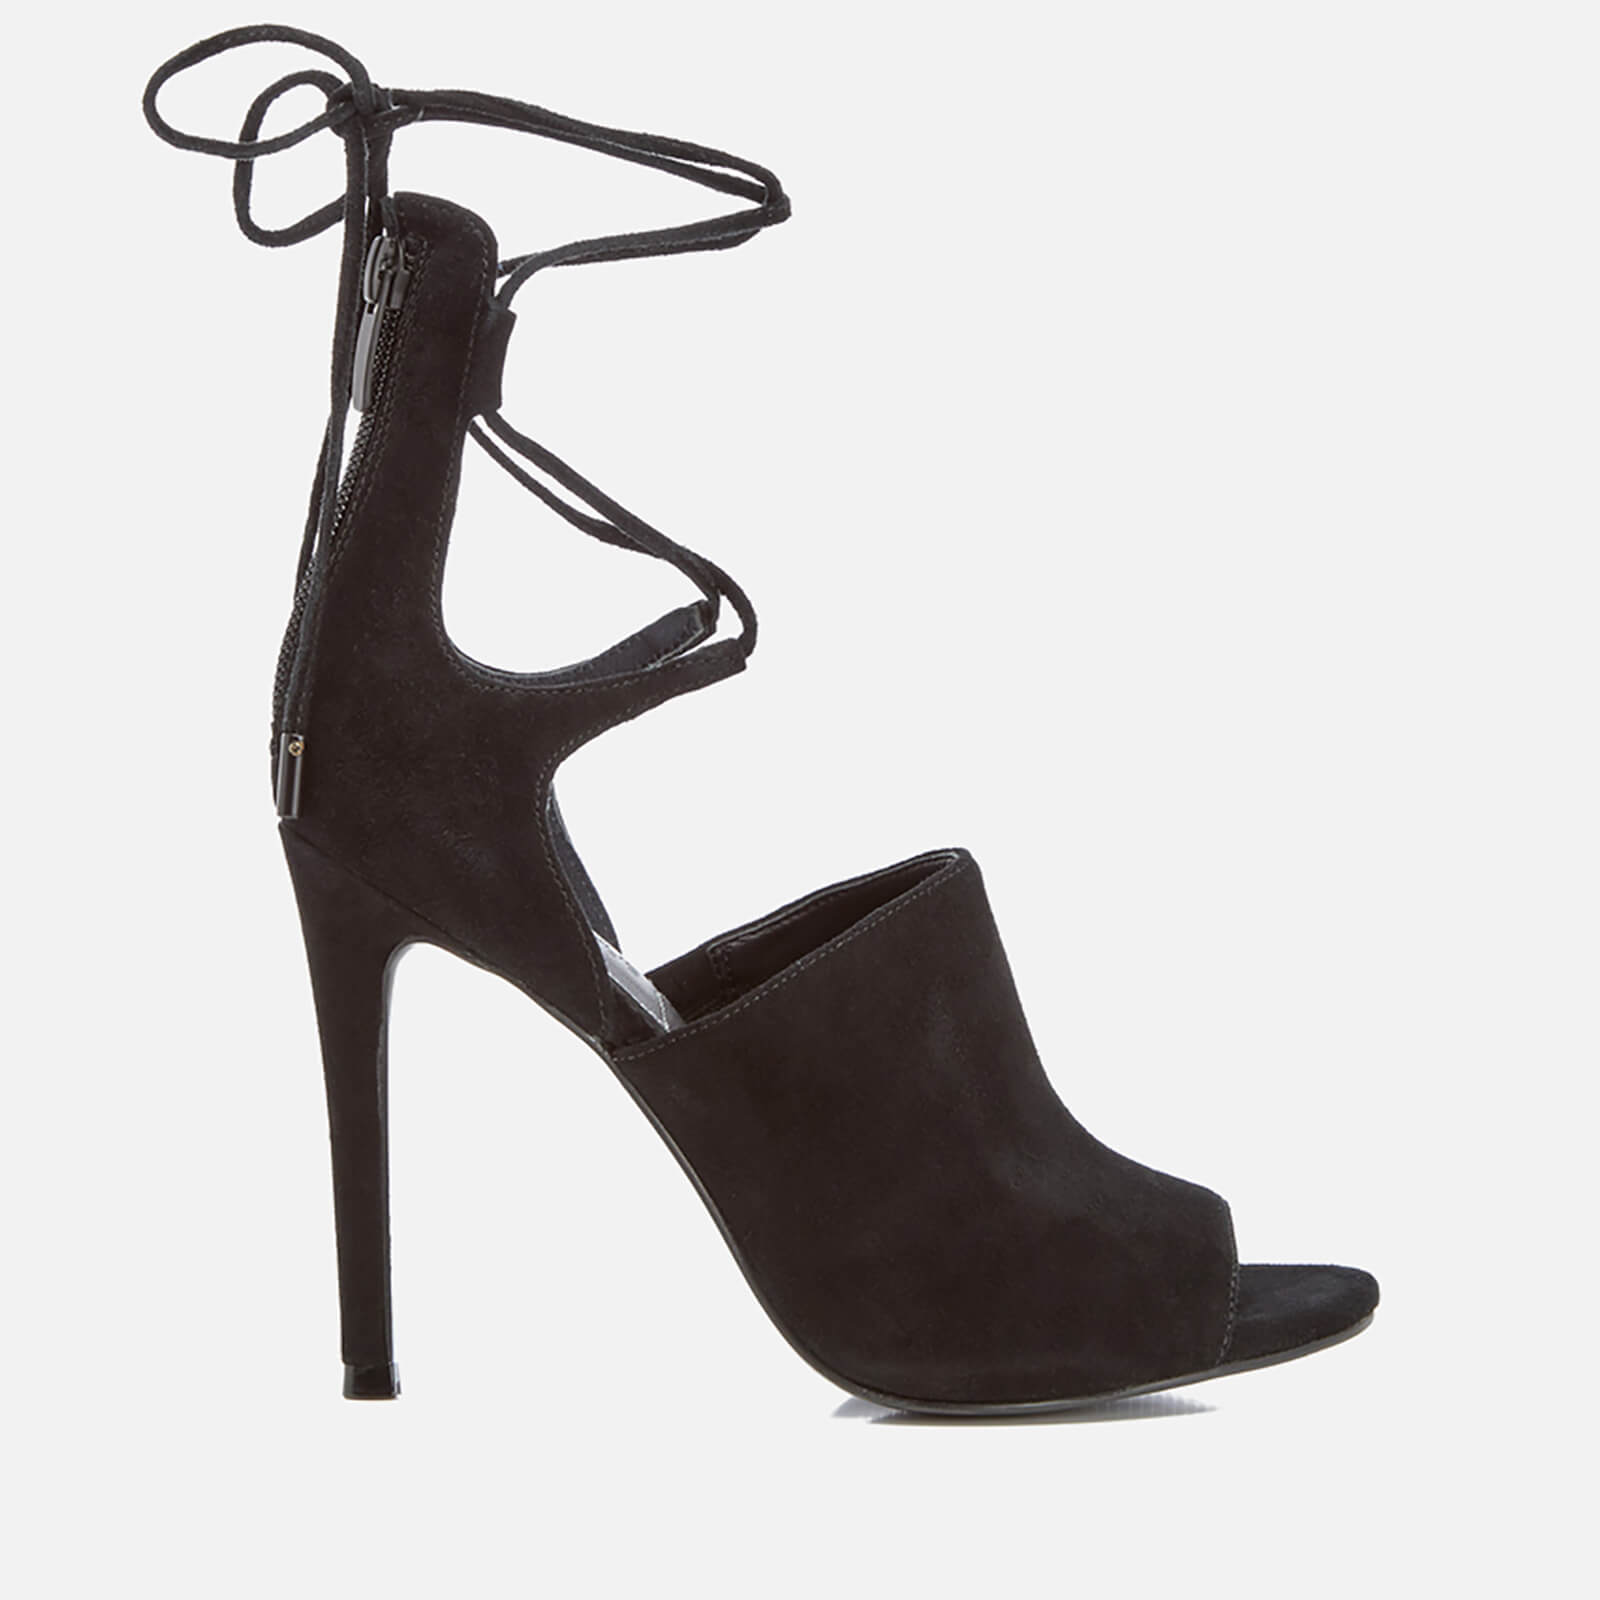 71680833cd5 Kendall + Kylie Women s Estella Suede Strappy Heeled Sandals - Black Womens  Footwear